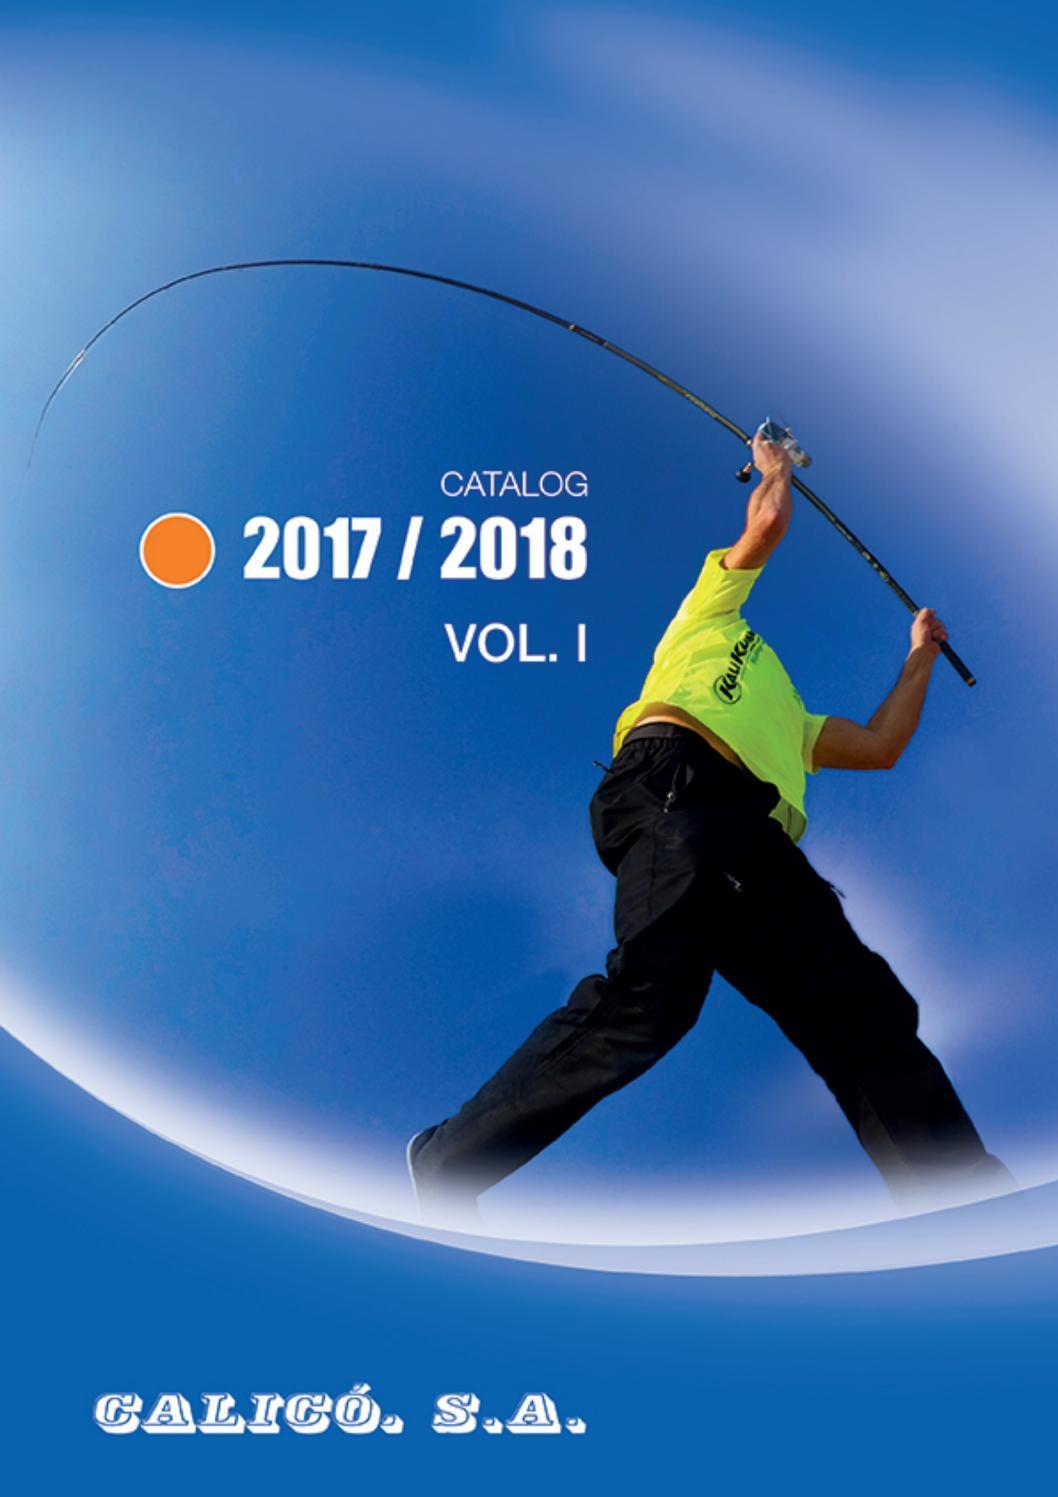 Kalikunnan 2018 By Fishing Issuu Frame Pato Fx 1 Alloy